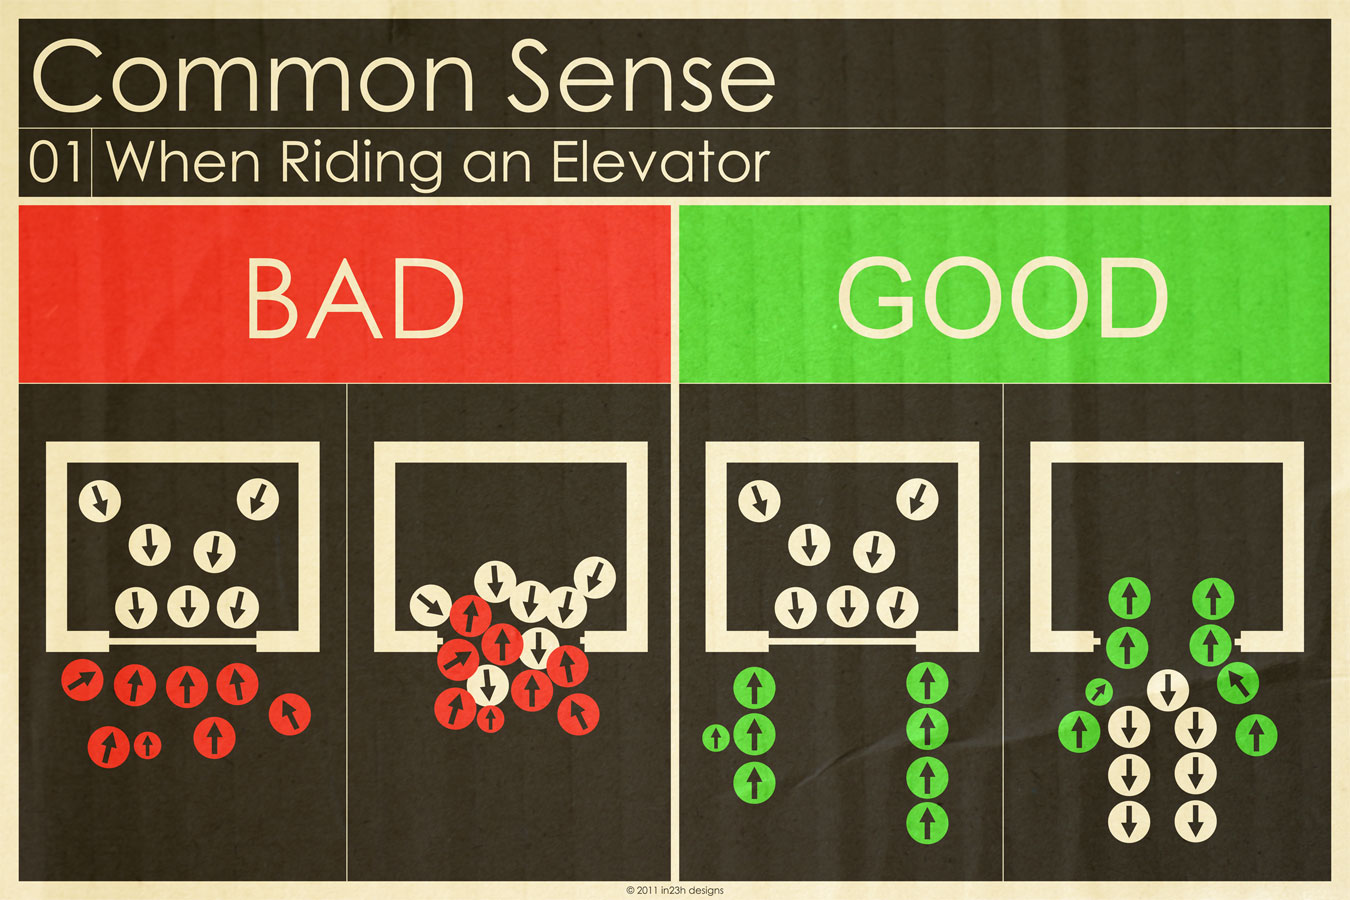 Common Sense 01 - Elevator